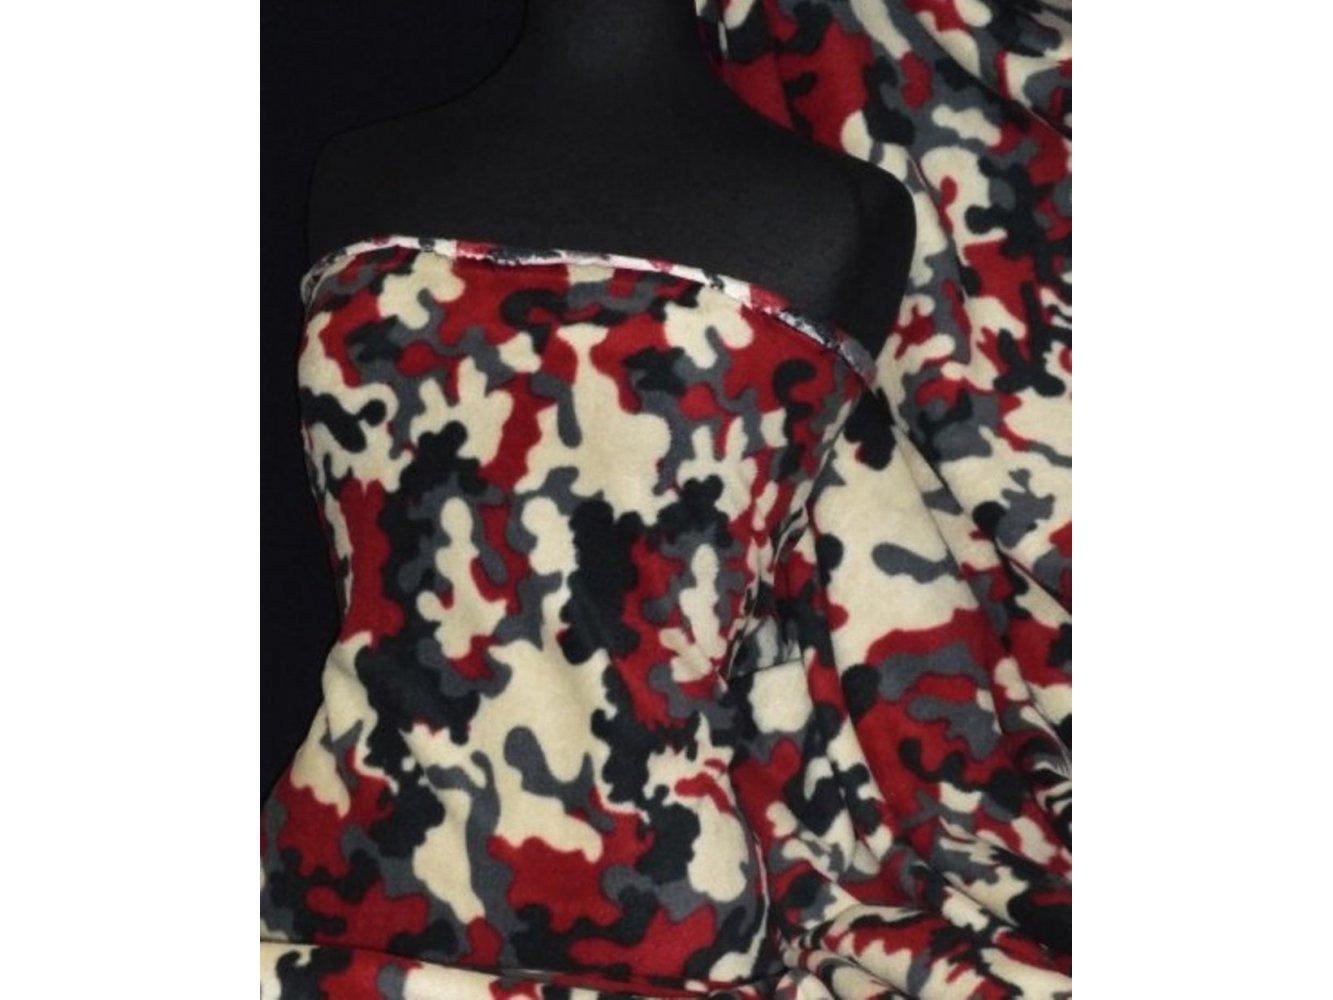 Polar Fleece Anti Pill Washable Soft Fabric- Multi Check